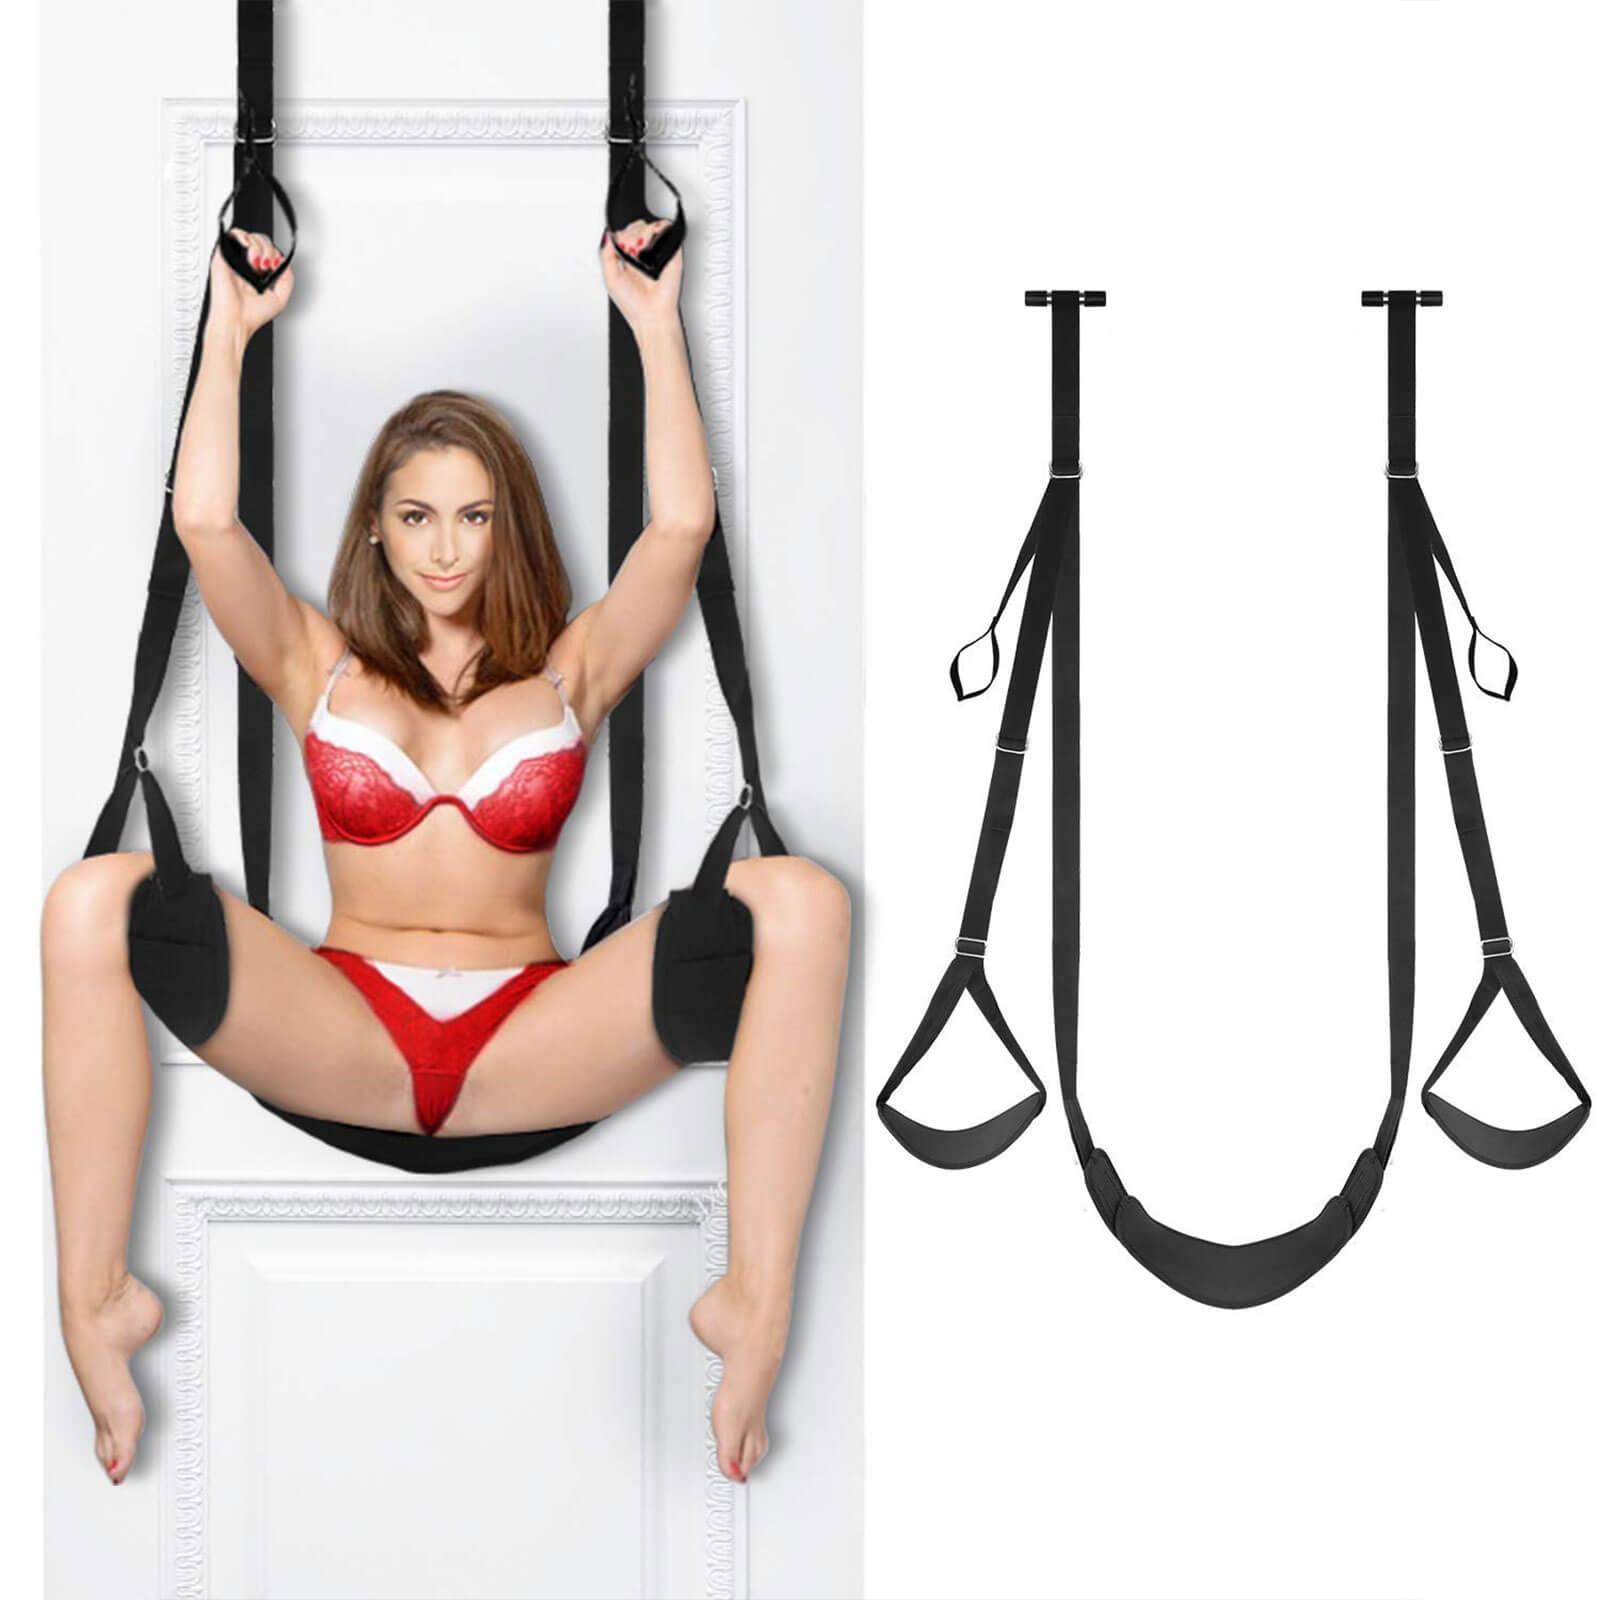 Hitinight Sex Swing With Seat